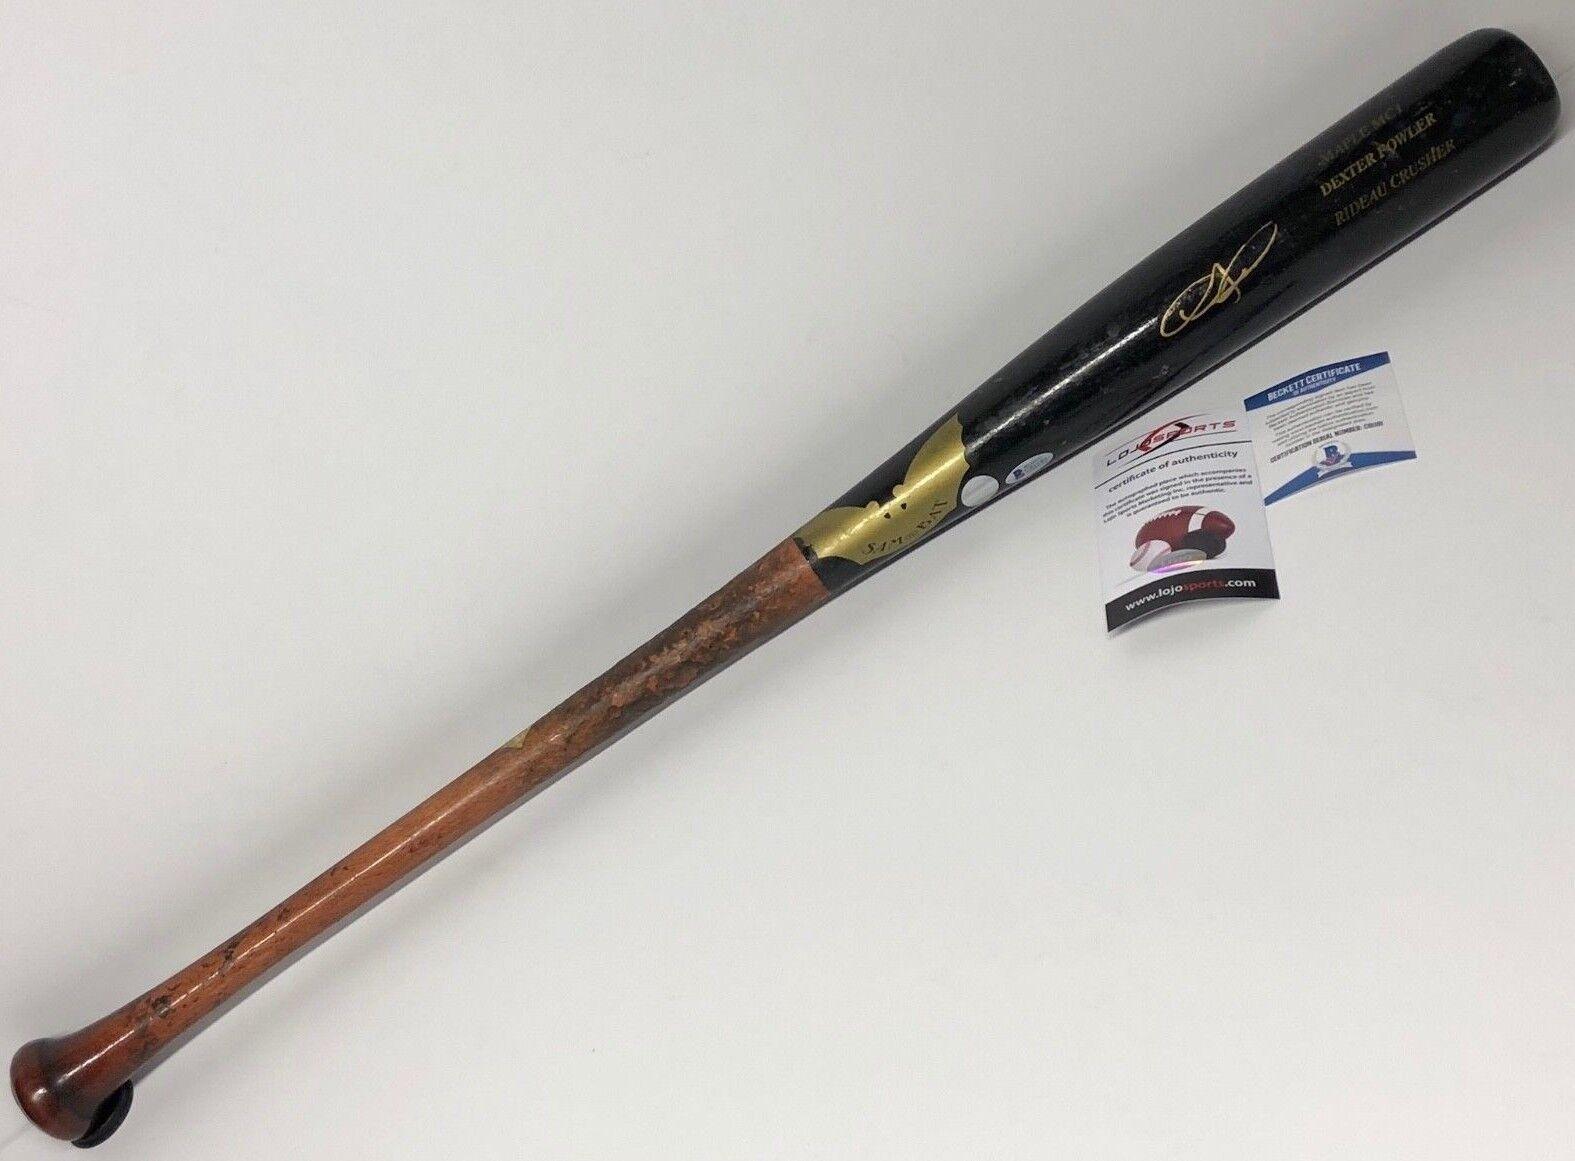 Dexter Fowler Signed Houston Astros Game Used Sam-Bat Baseball Bat Beckett 81181